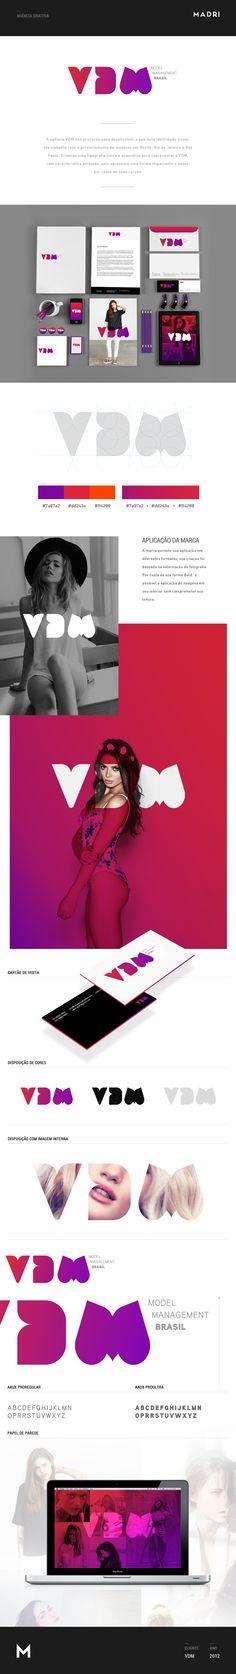 VDM Branding, Fashion, Fashion Styling